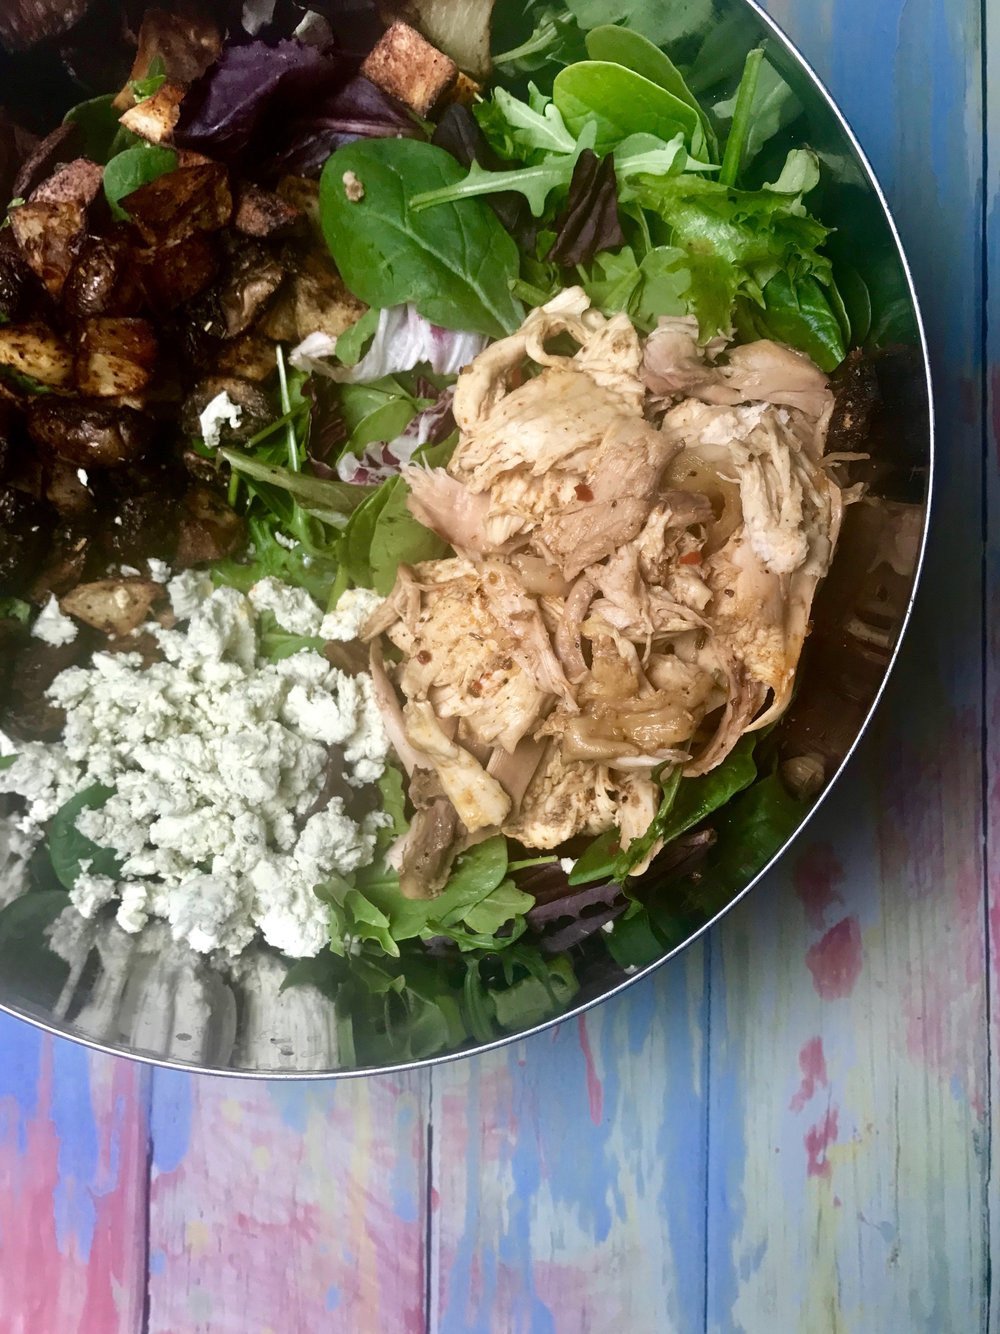 roasted chicken, mushroom, and potato salad